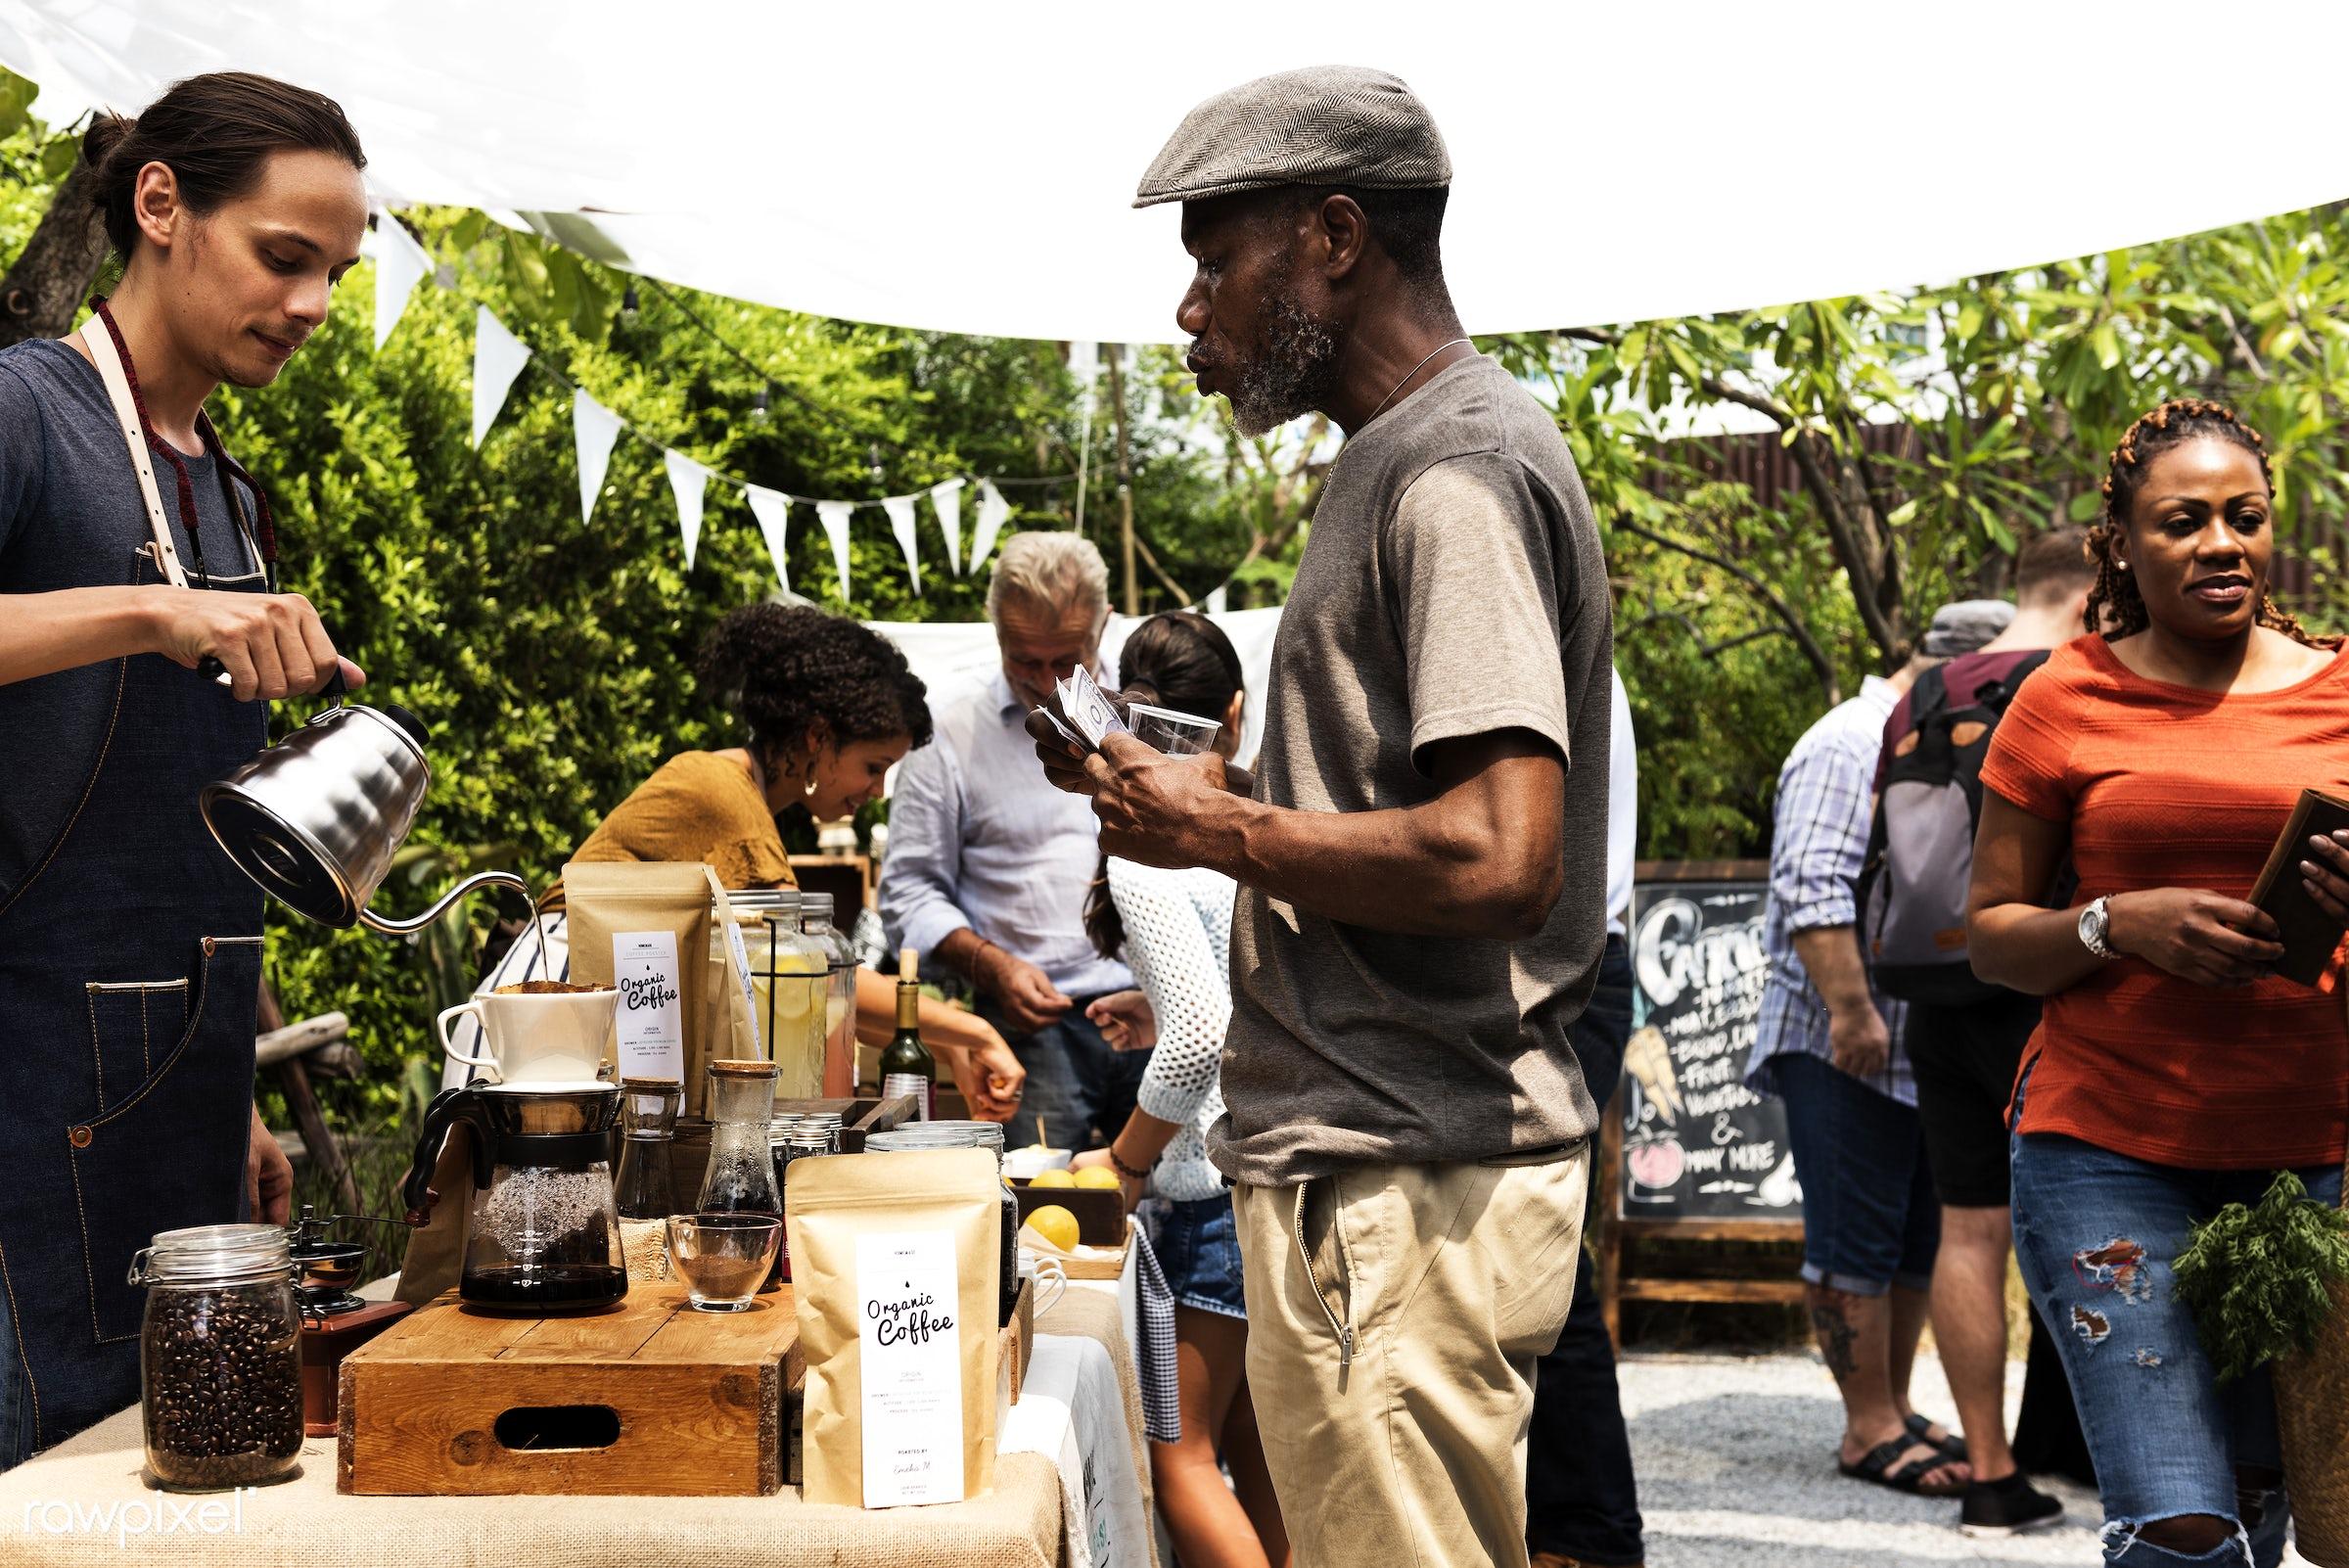 shop, person, aroma, caffeine, people, pot, farmer, brew, woman, lifestyle, blend, drink, refresh, preparation, coffee,...